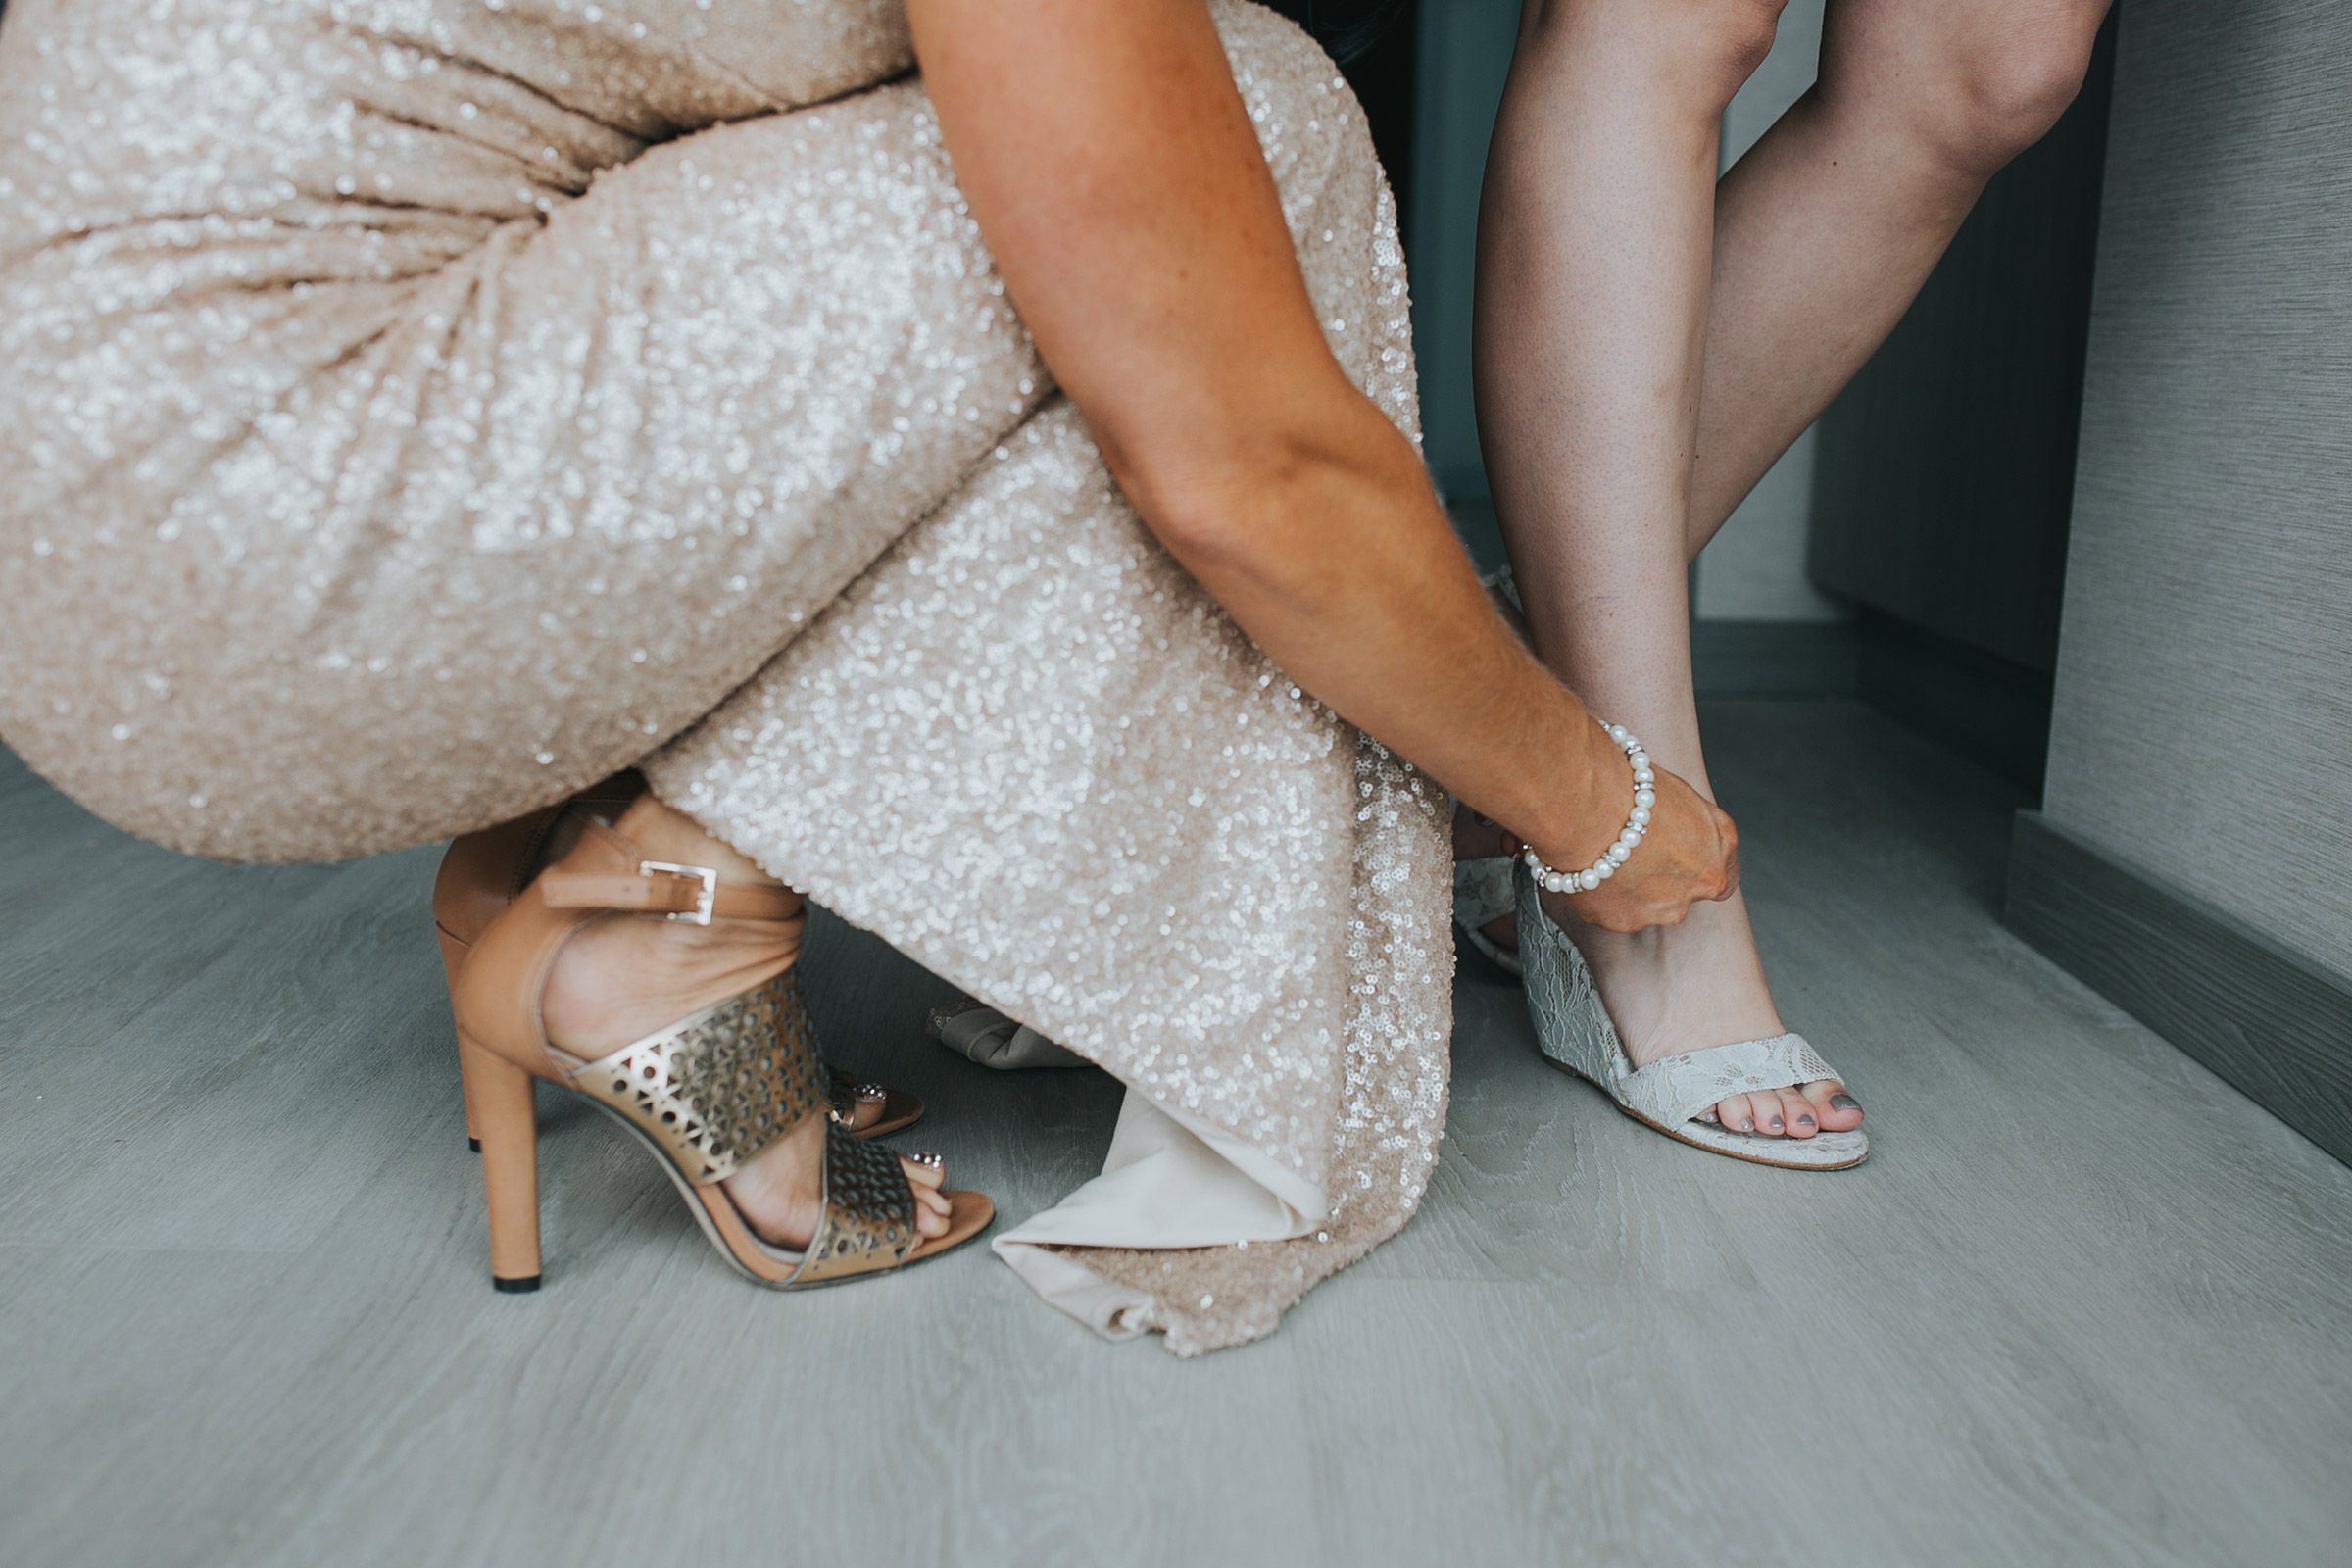 bridesmaid-helping-bride-put-shoes-on-desmoines-iowa-ac-hotel-raelyn-ramey-photography.jpg